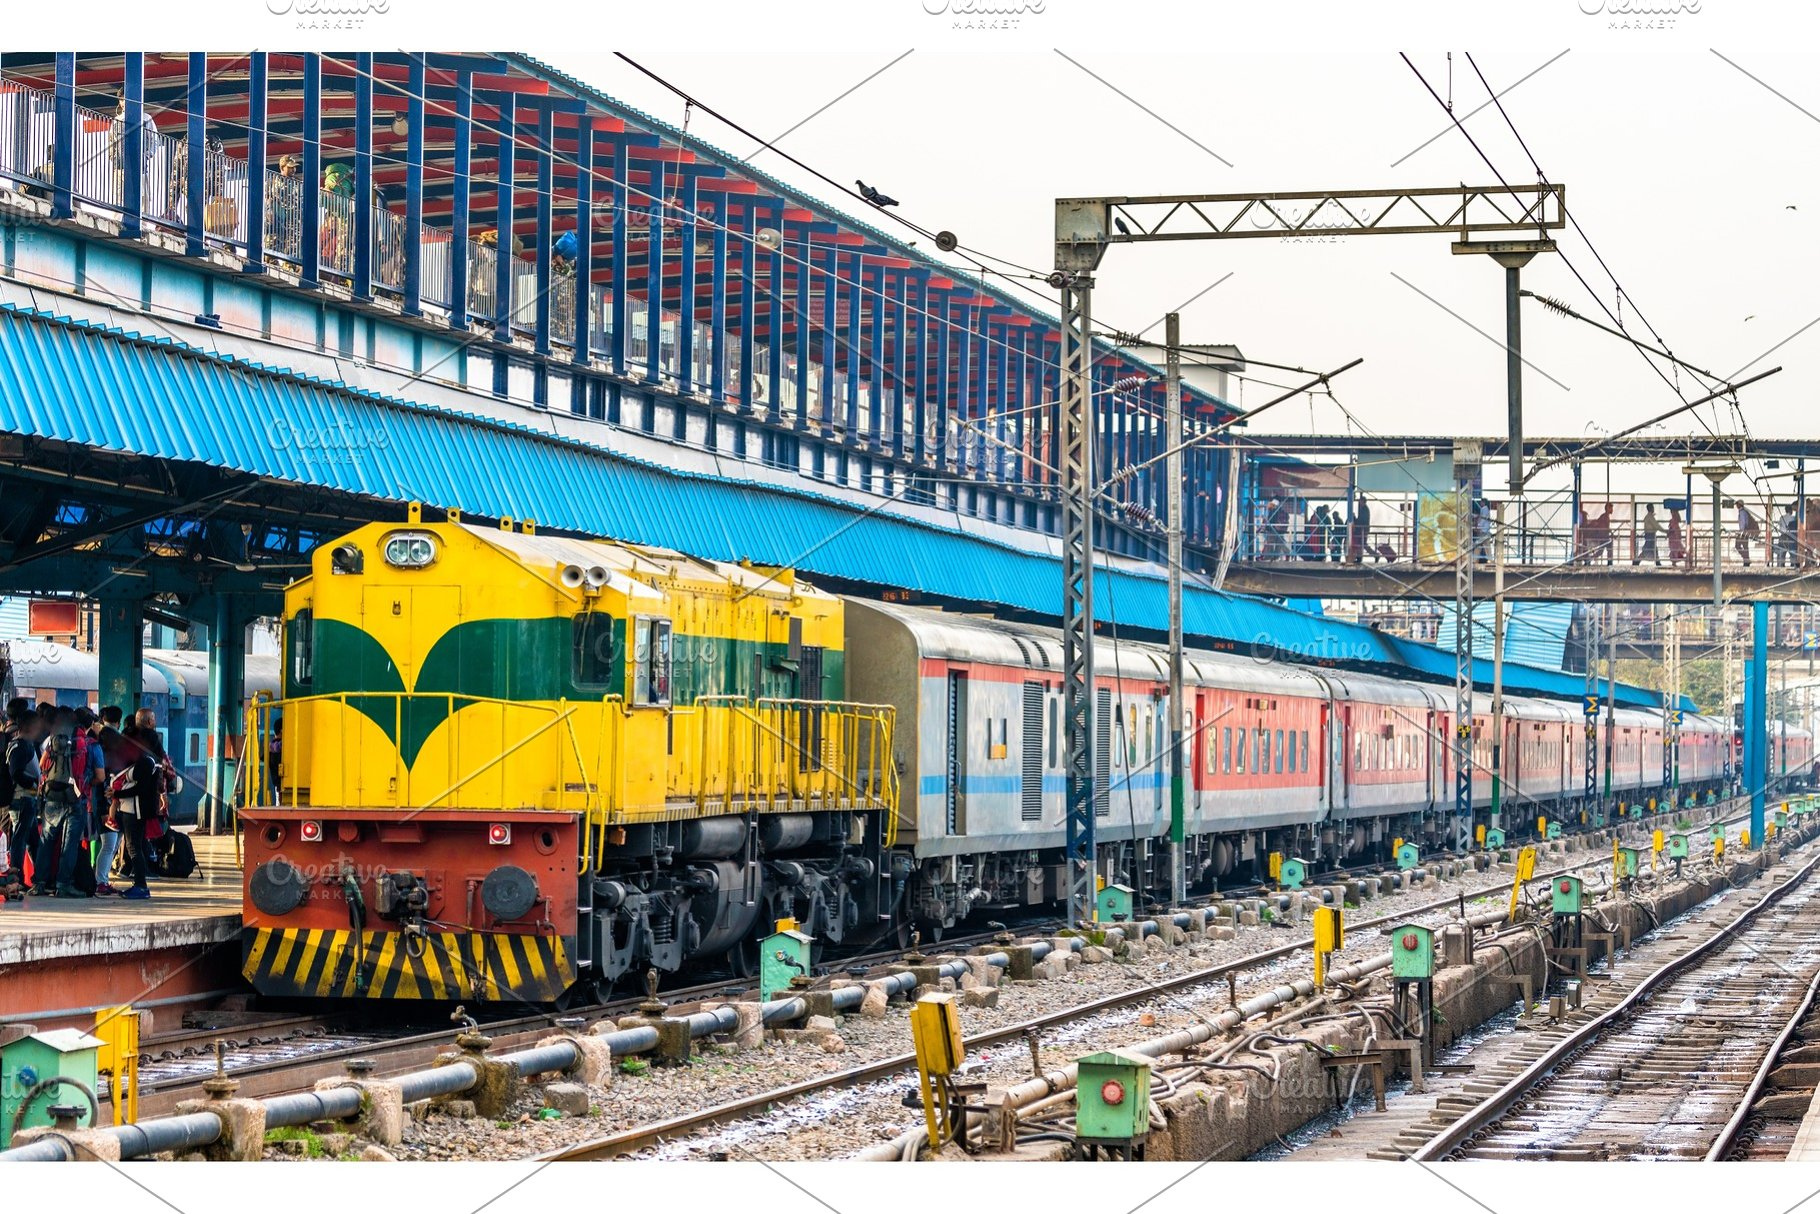 Public Transport Options in Delhi: New Delhi Railway Station